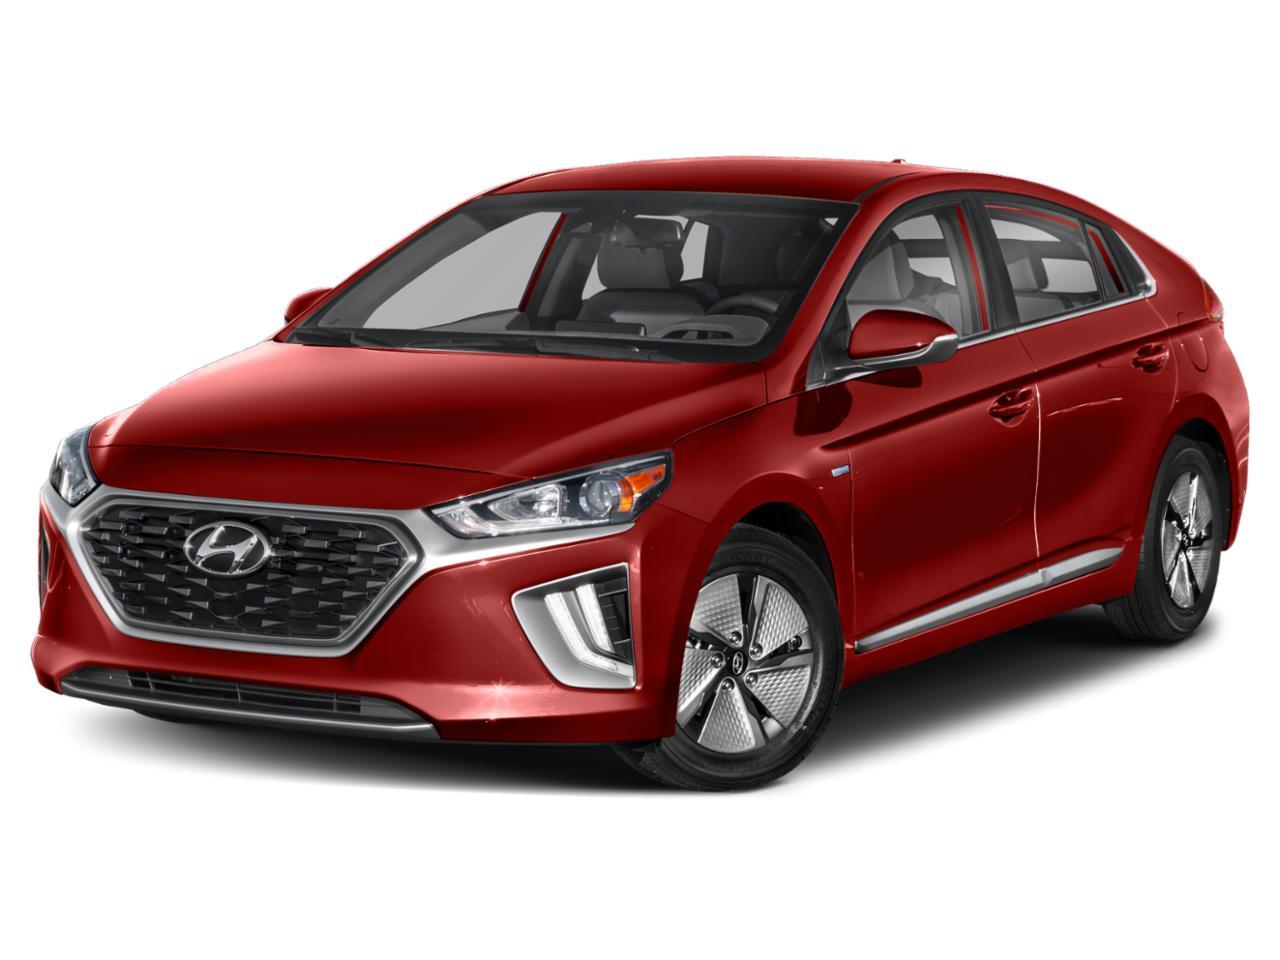 2021 Hyundai IONIQ Hybrid Vehicle Photo in Nashua, NH 03060